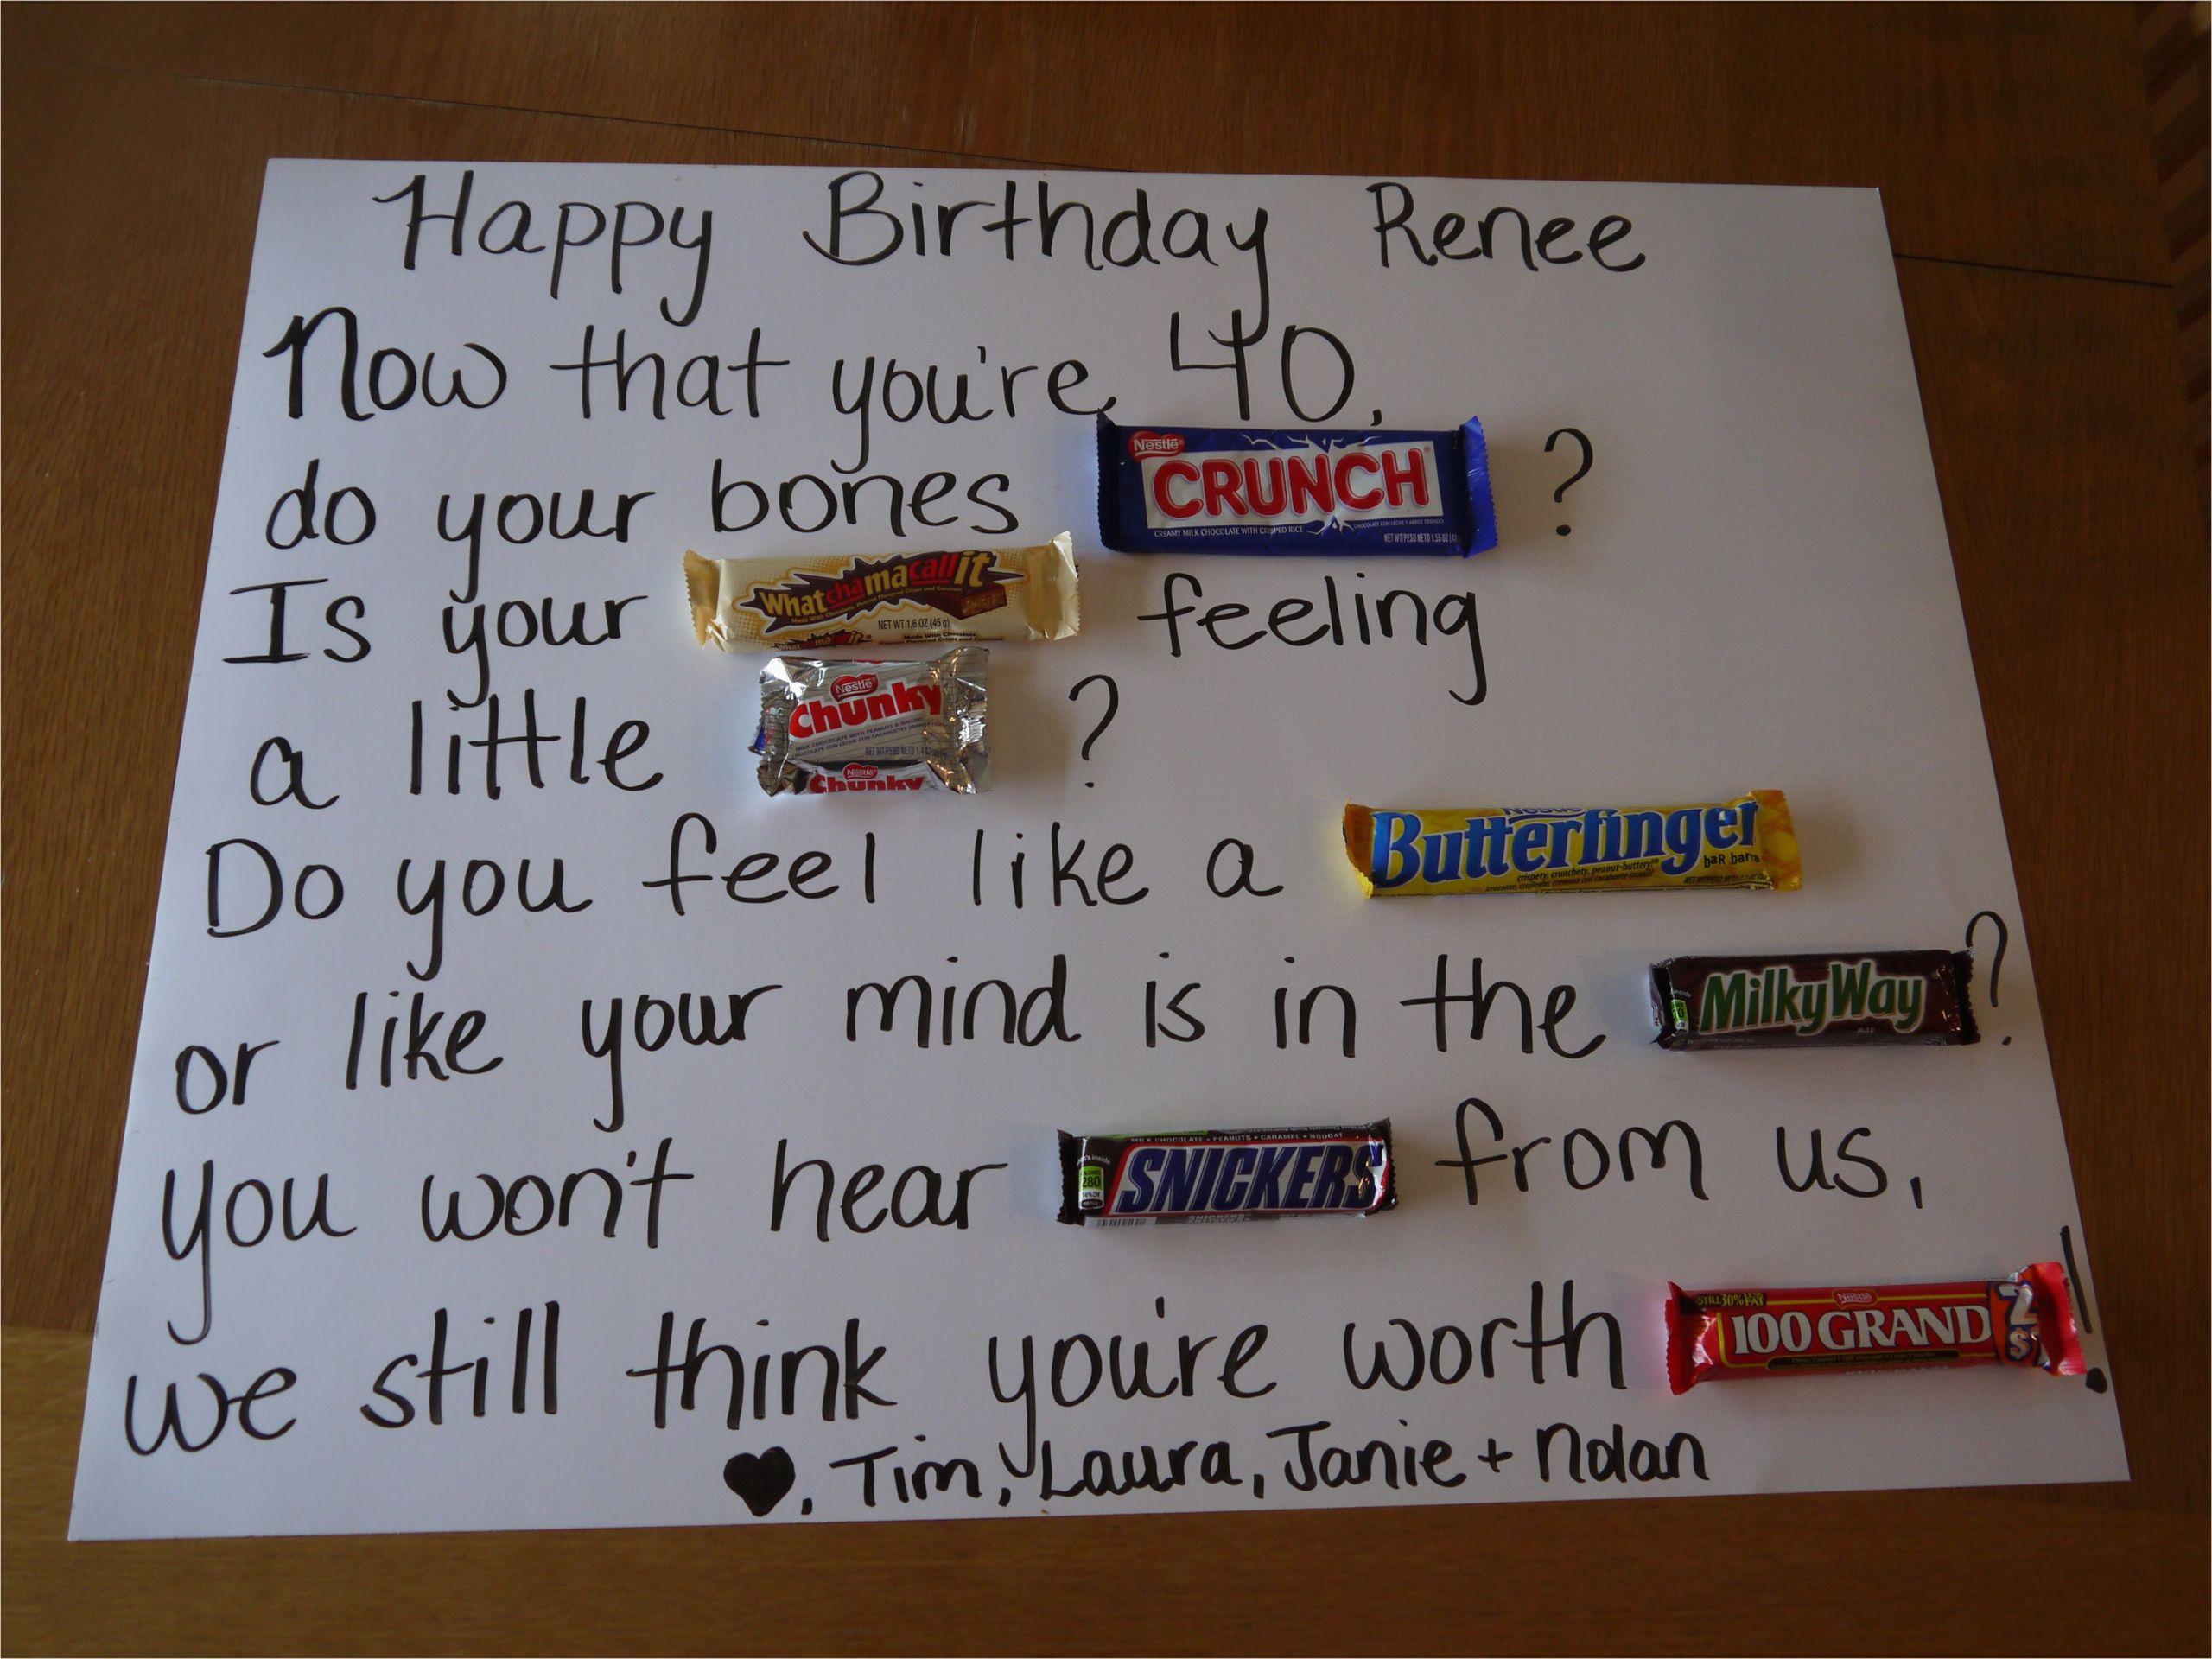 Unusual 40th Birthday Presents for Him 40th Birthday Ideas Party Ideas 40th Birthday Gifts